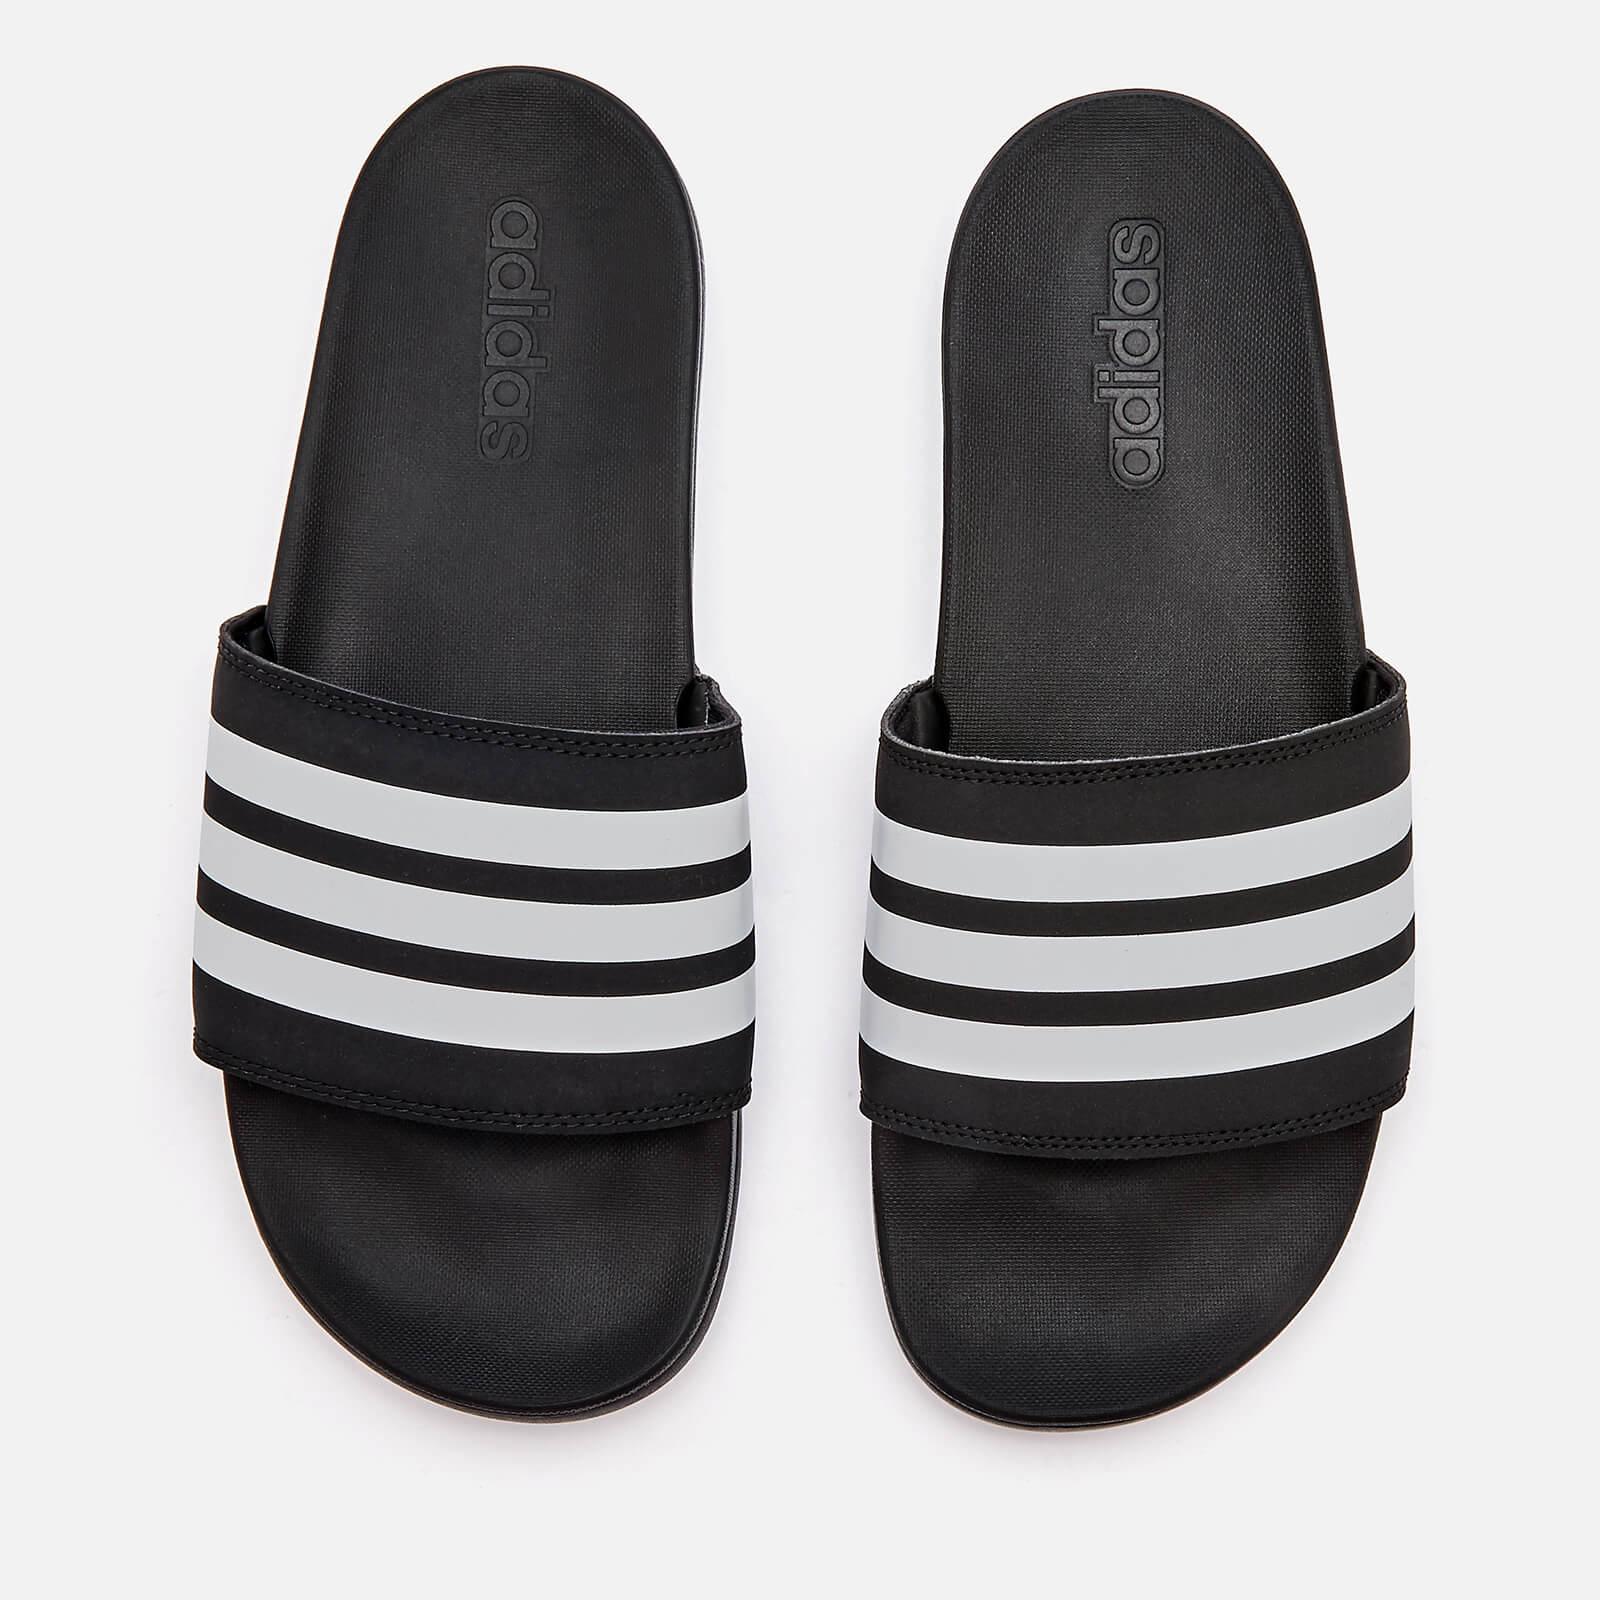 b80916adfb434 adidas Men's Adilette Comfort Slide Sandals - Core Black